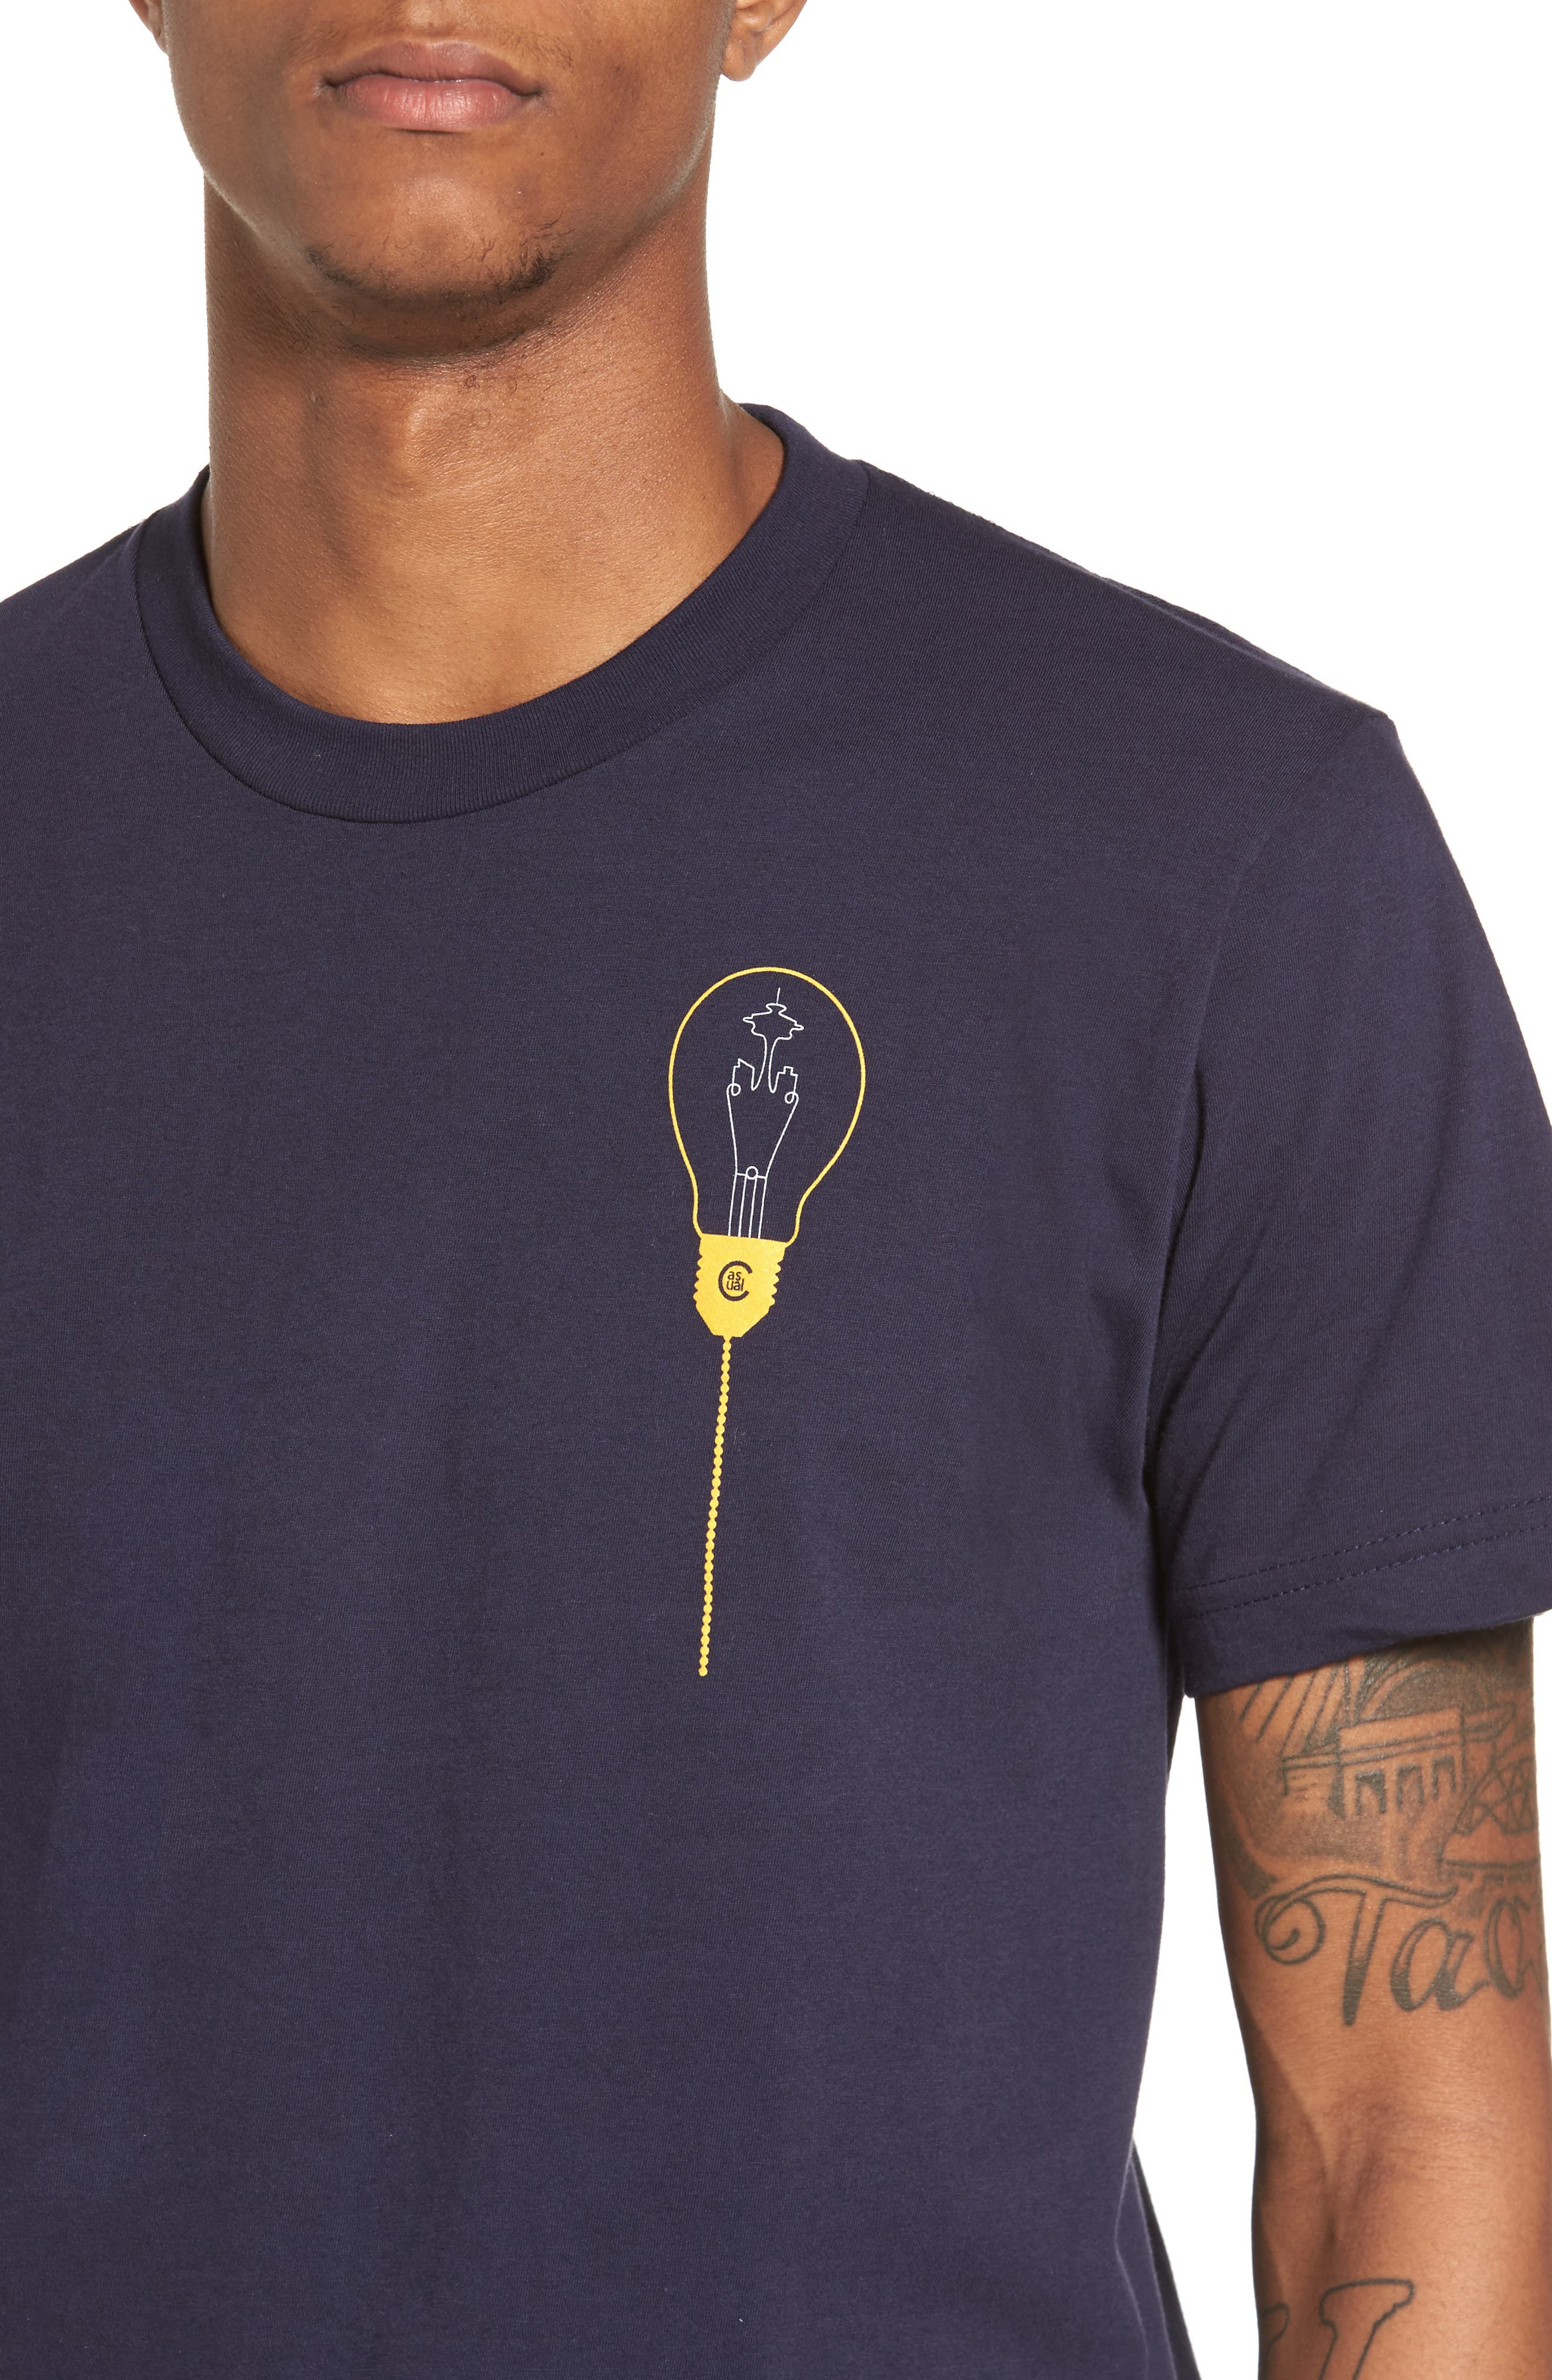 Keeping Seatown Lit T-Shirt,                             Alternate thumbnail 4, color,                             Navy